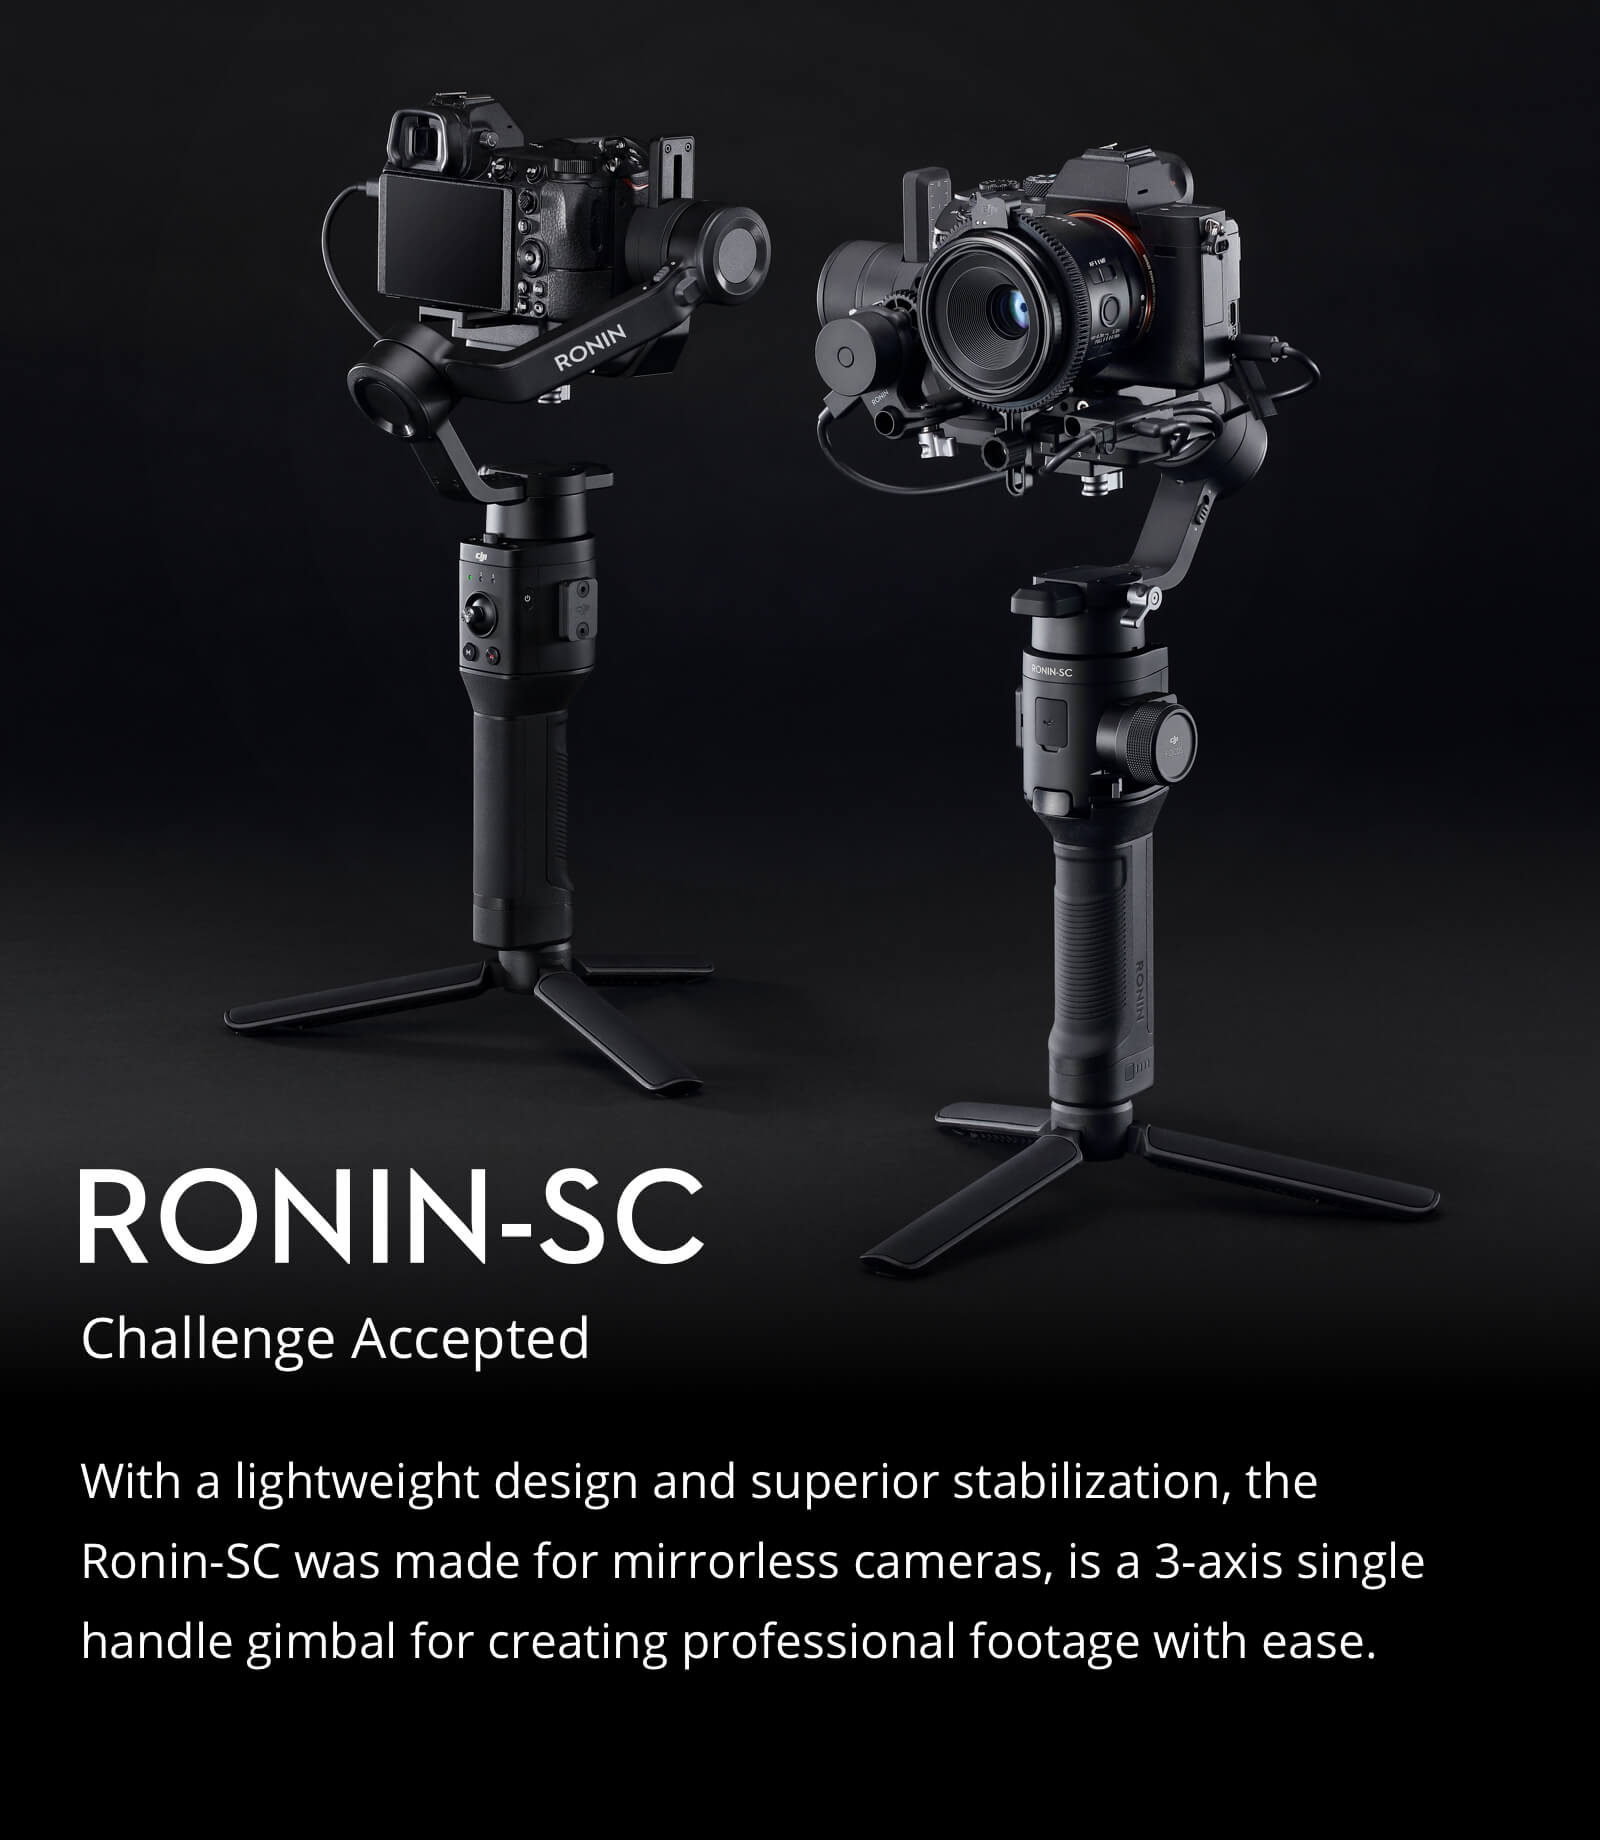 DJI Ronin-SC Gimbal Stabilizer 4